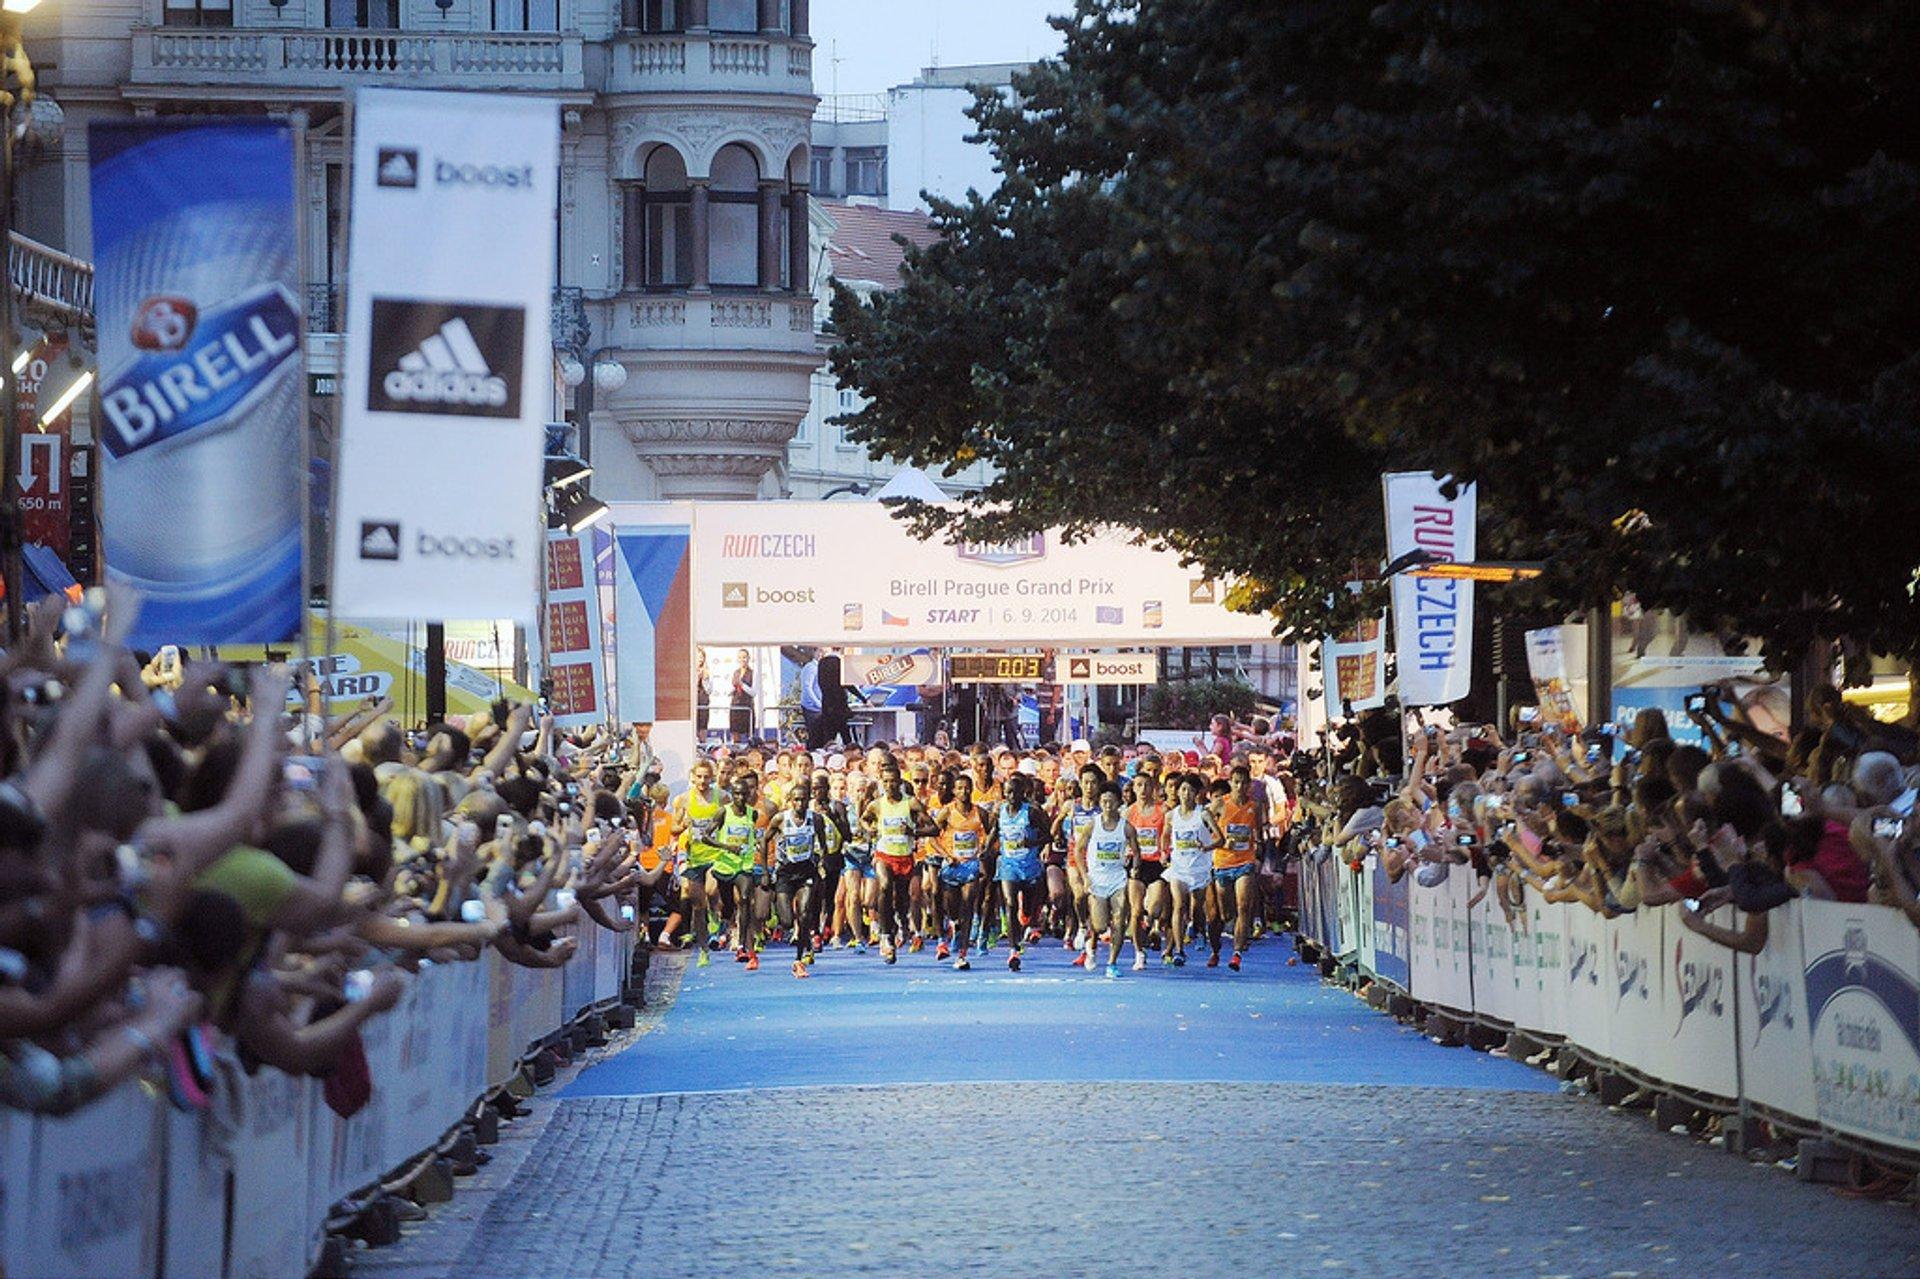 Best time for Birell Prague Grand Prix in Prague 2019